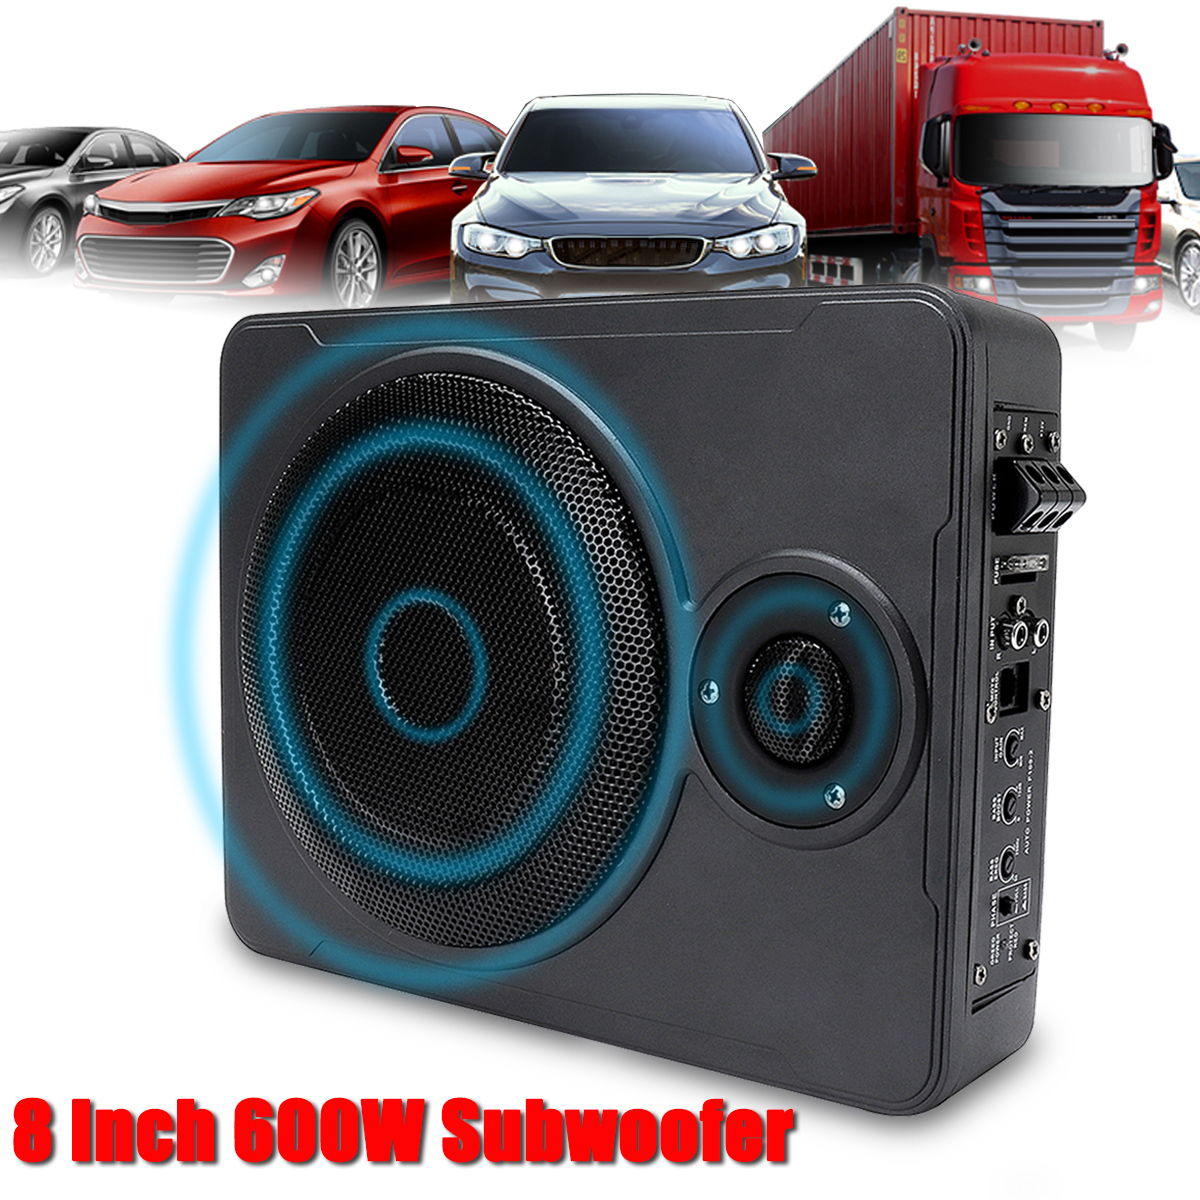 8 zoll bluetooth Auto Hause Subwoofer Unter Sitz Unter 600W Stereo Subwoofer Auto Audio Lautsprecher Musik System Ton Woofer